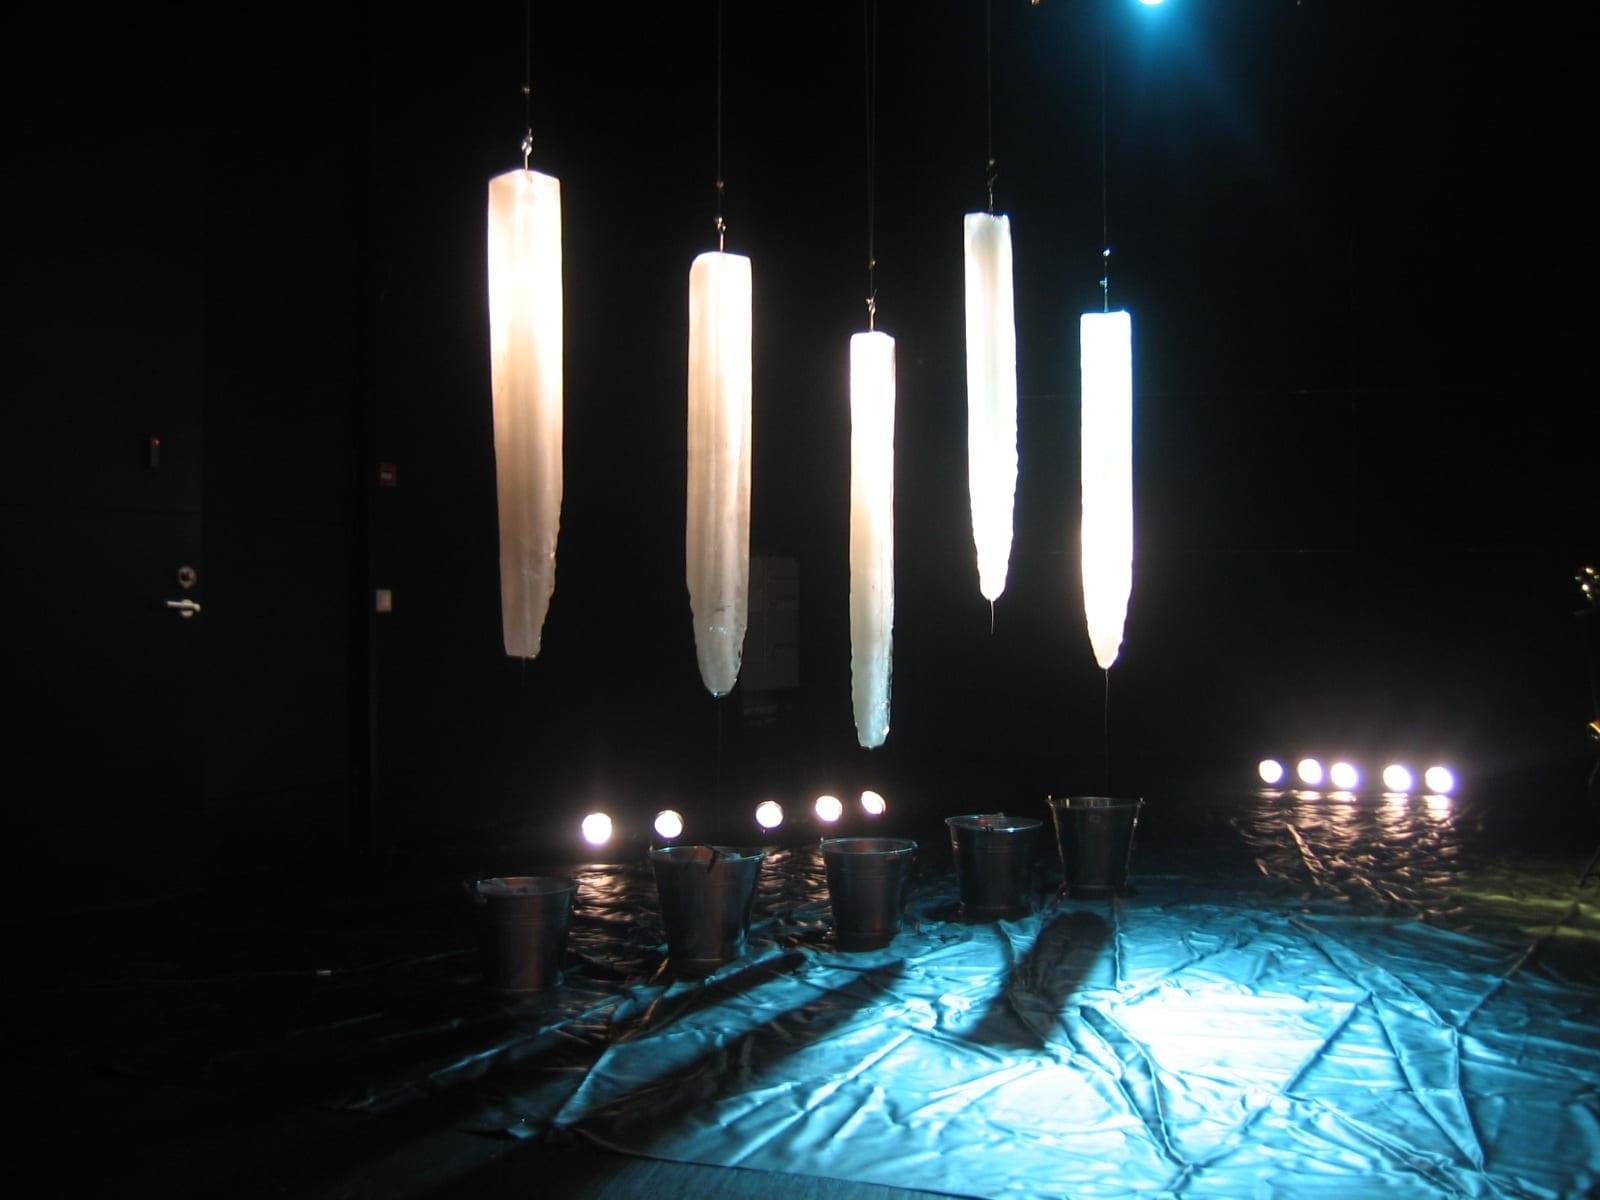 INSTALLATSIOON R.SIBULA KONTSERILE KUMUS 2007 Tallinn, Eesti jää, plekkämbrid, heli, valgus <br/>INSTALLATION FOR A CONCERT OF R.SIBUL IN THE ART MUSEUM KUMU 2007 ice, metal buckets, sound, light